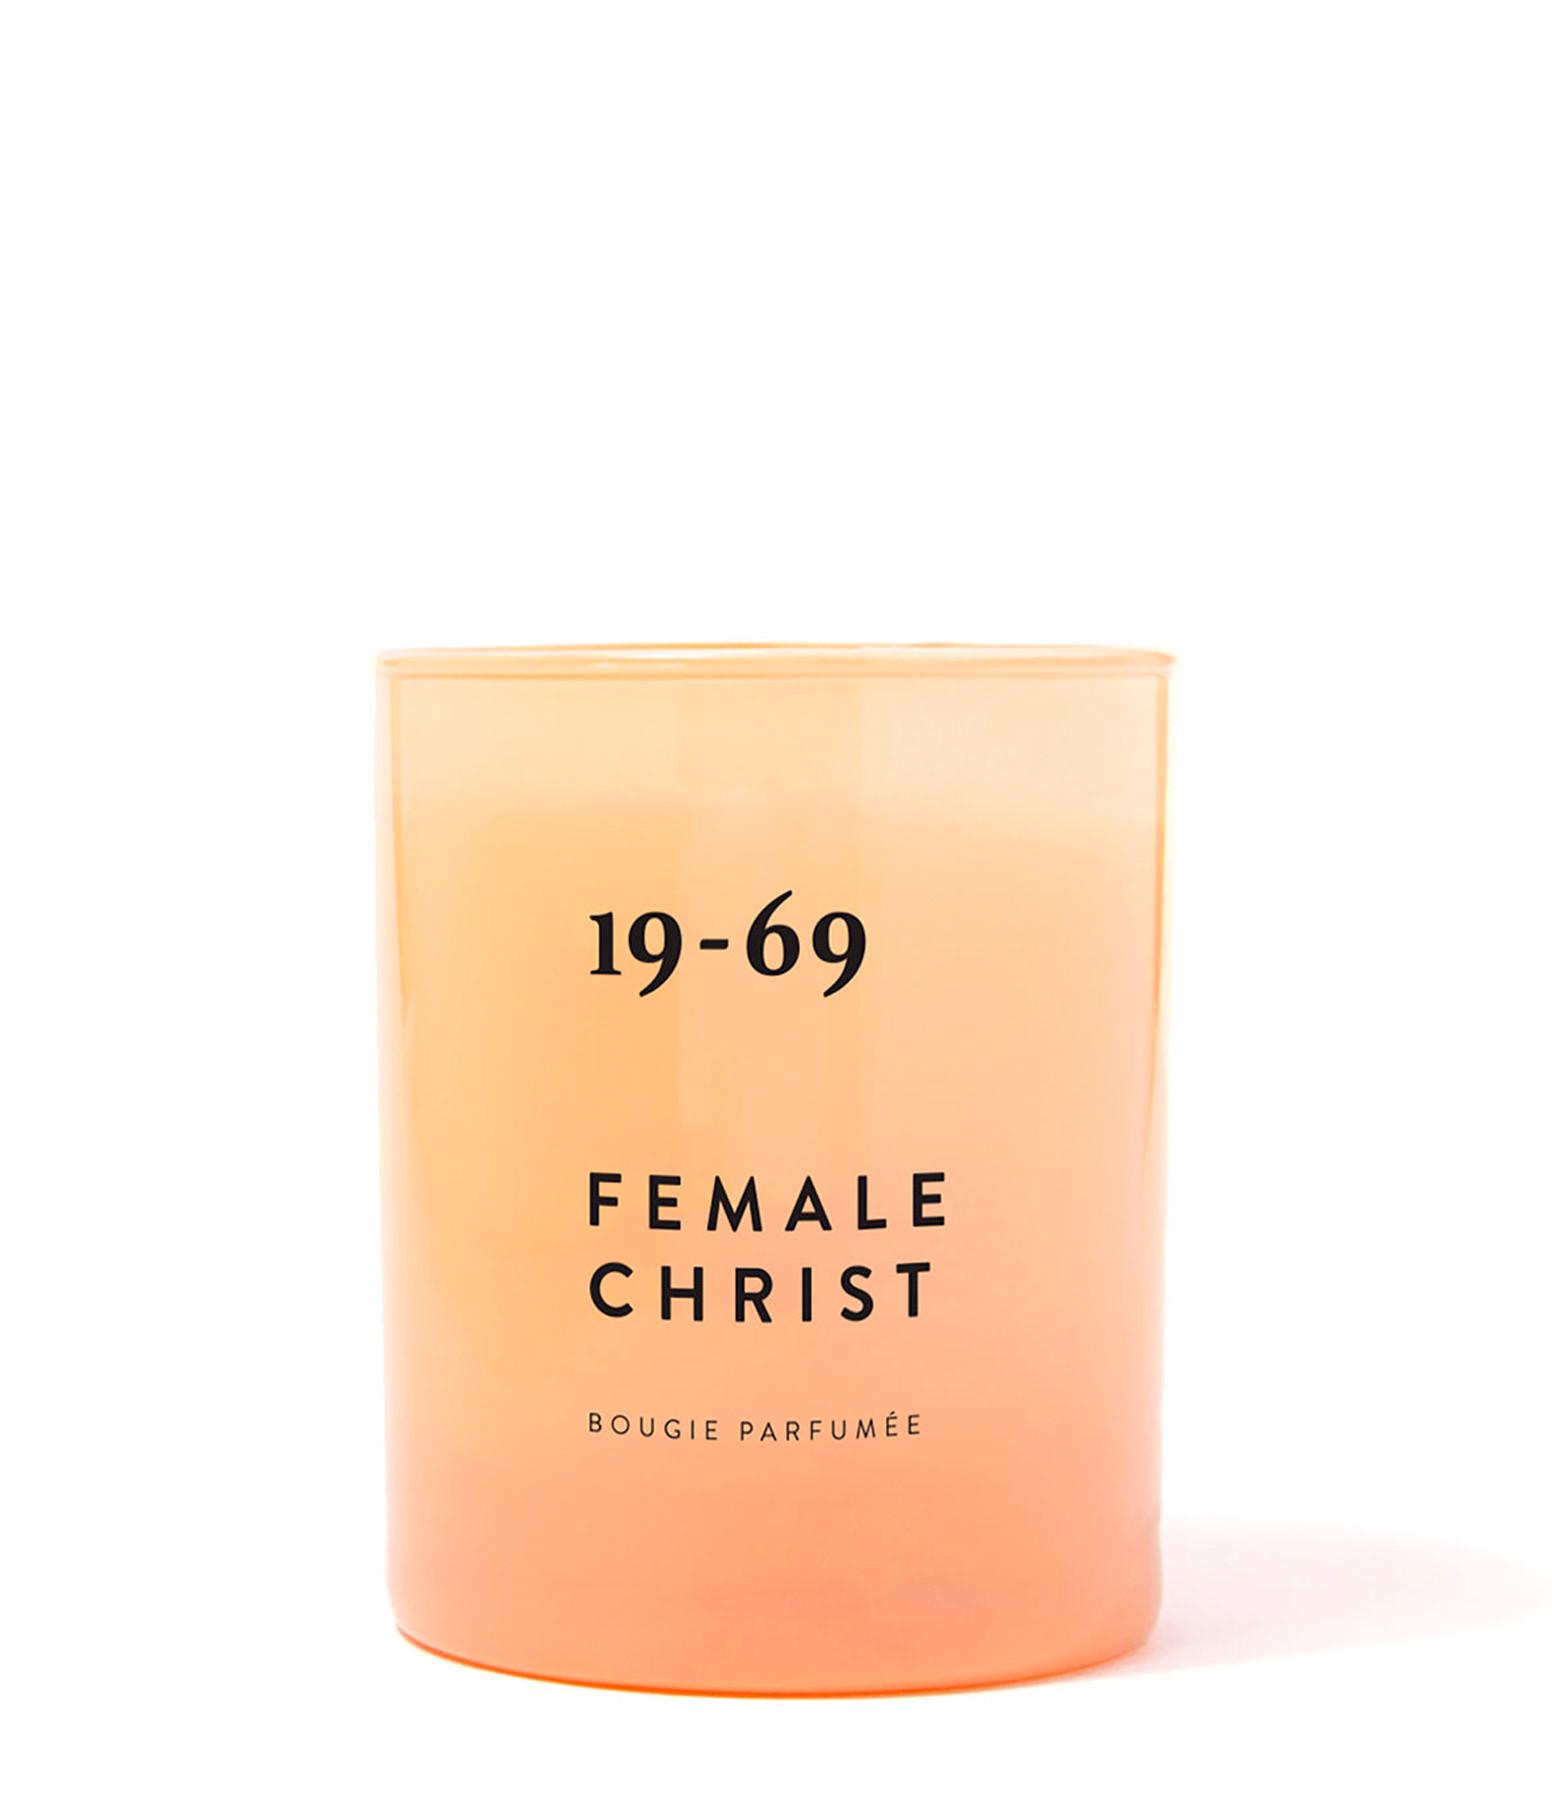 19-69 - Bougie Female Christ 200 ml